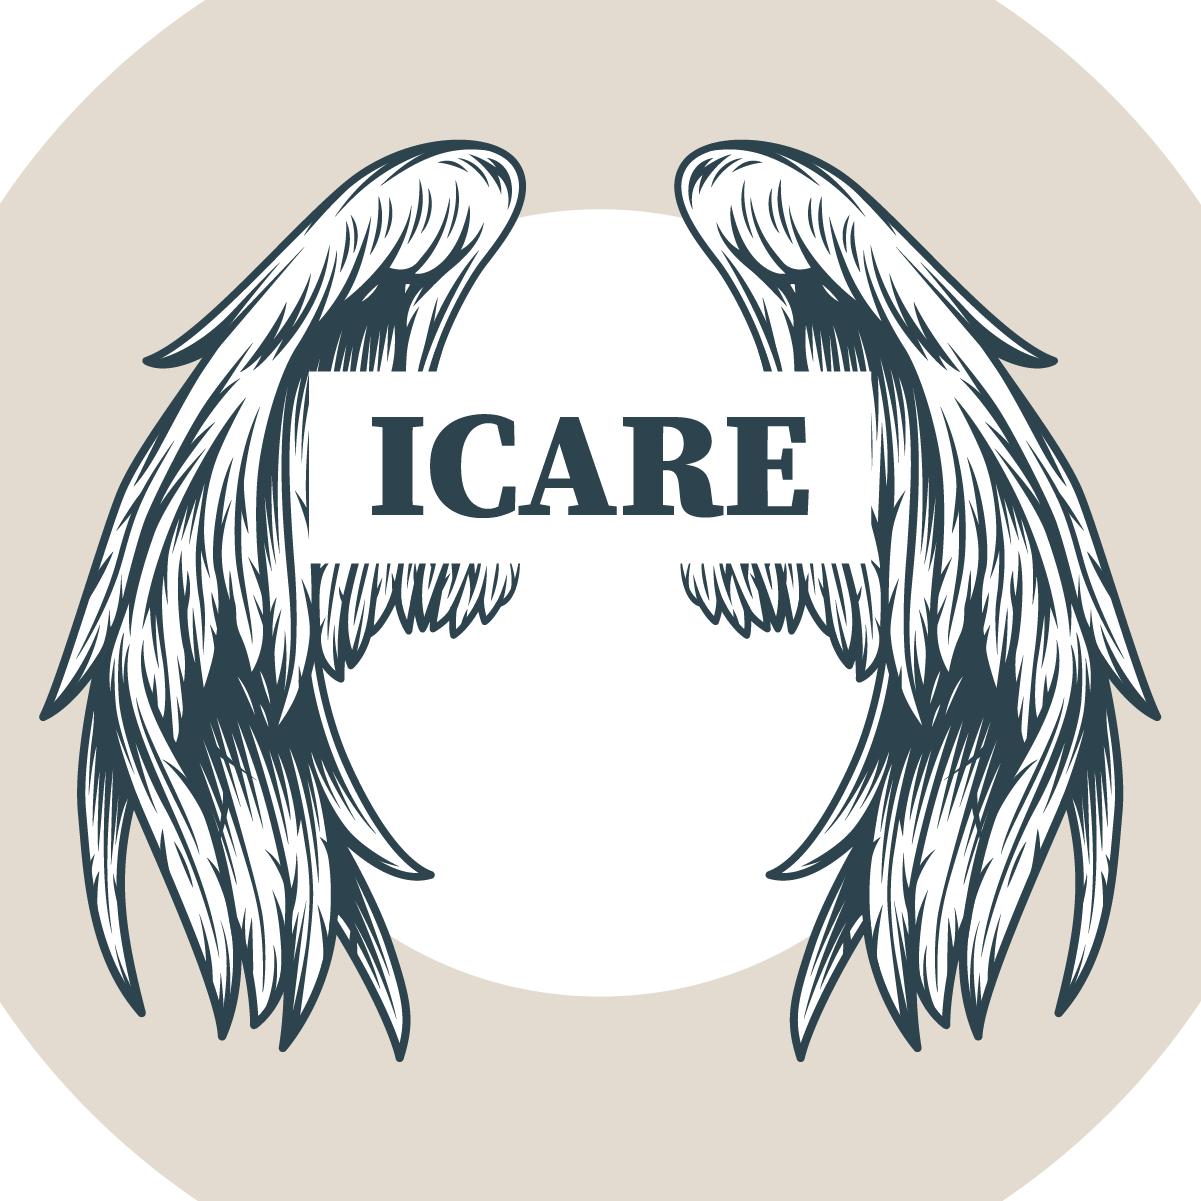 Icare, de Carl Philippe Gionet